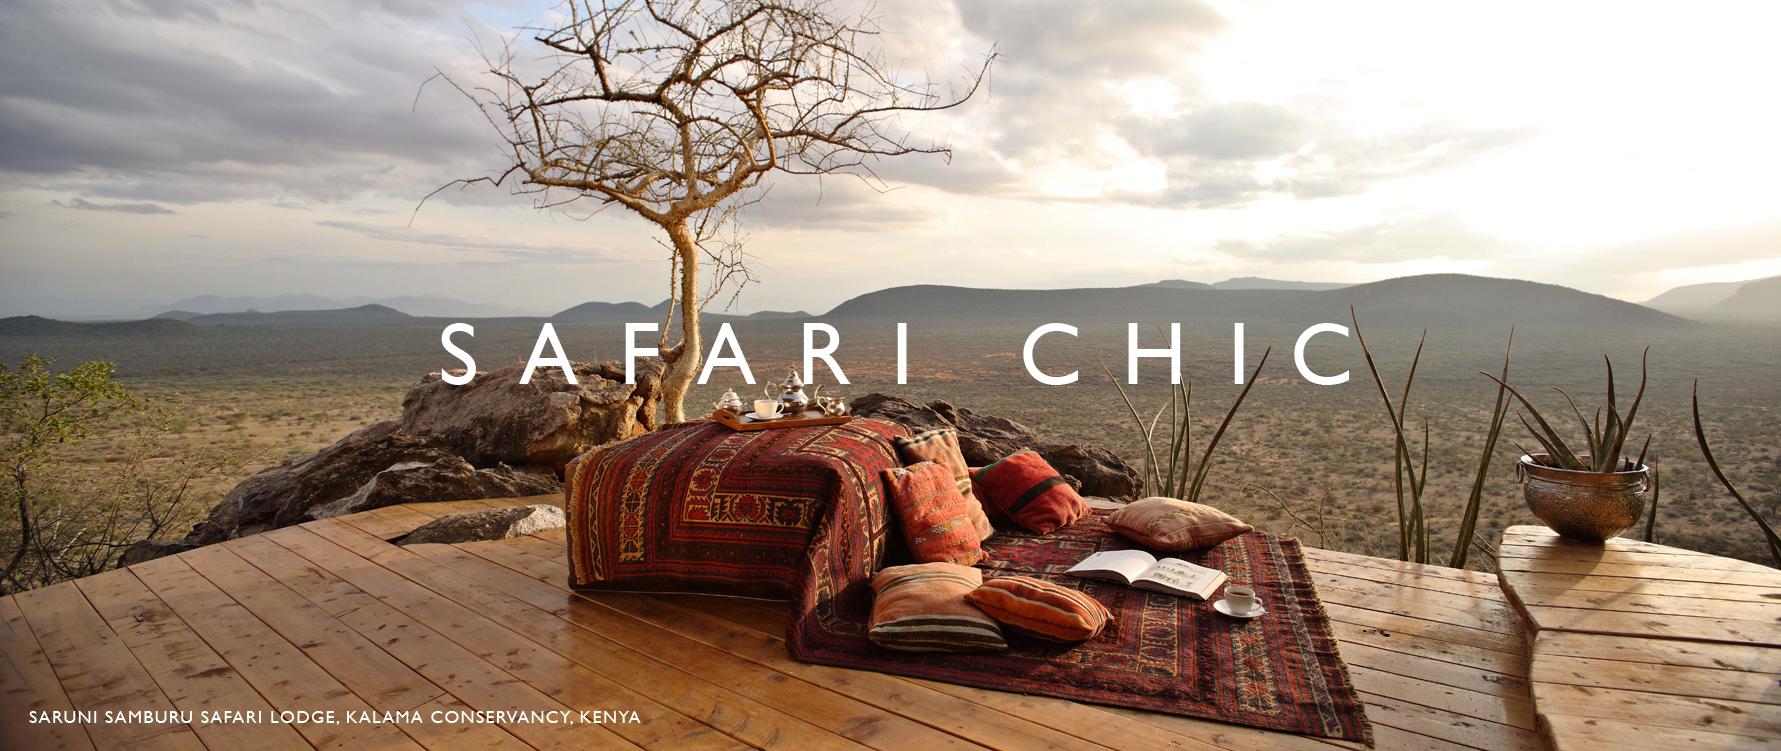 Safari Chic